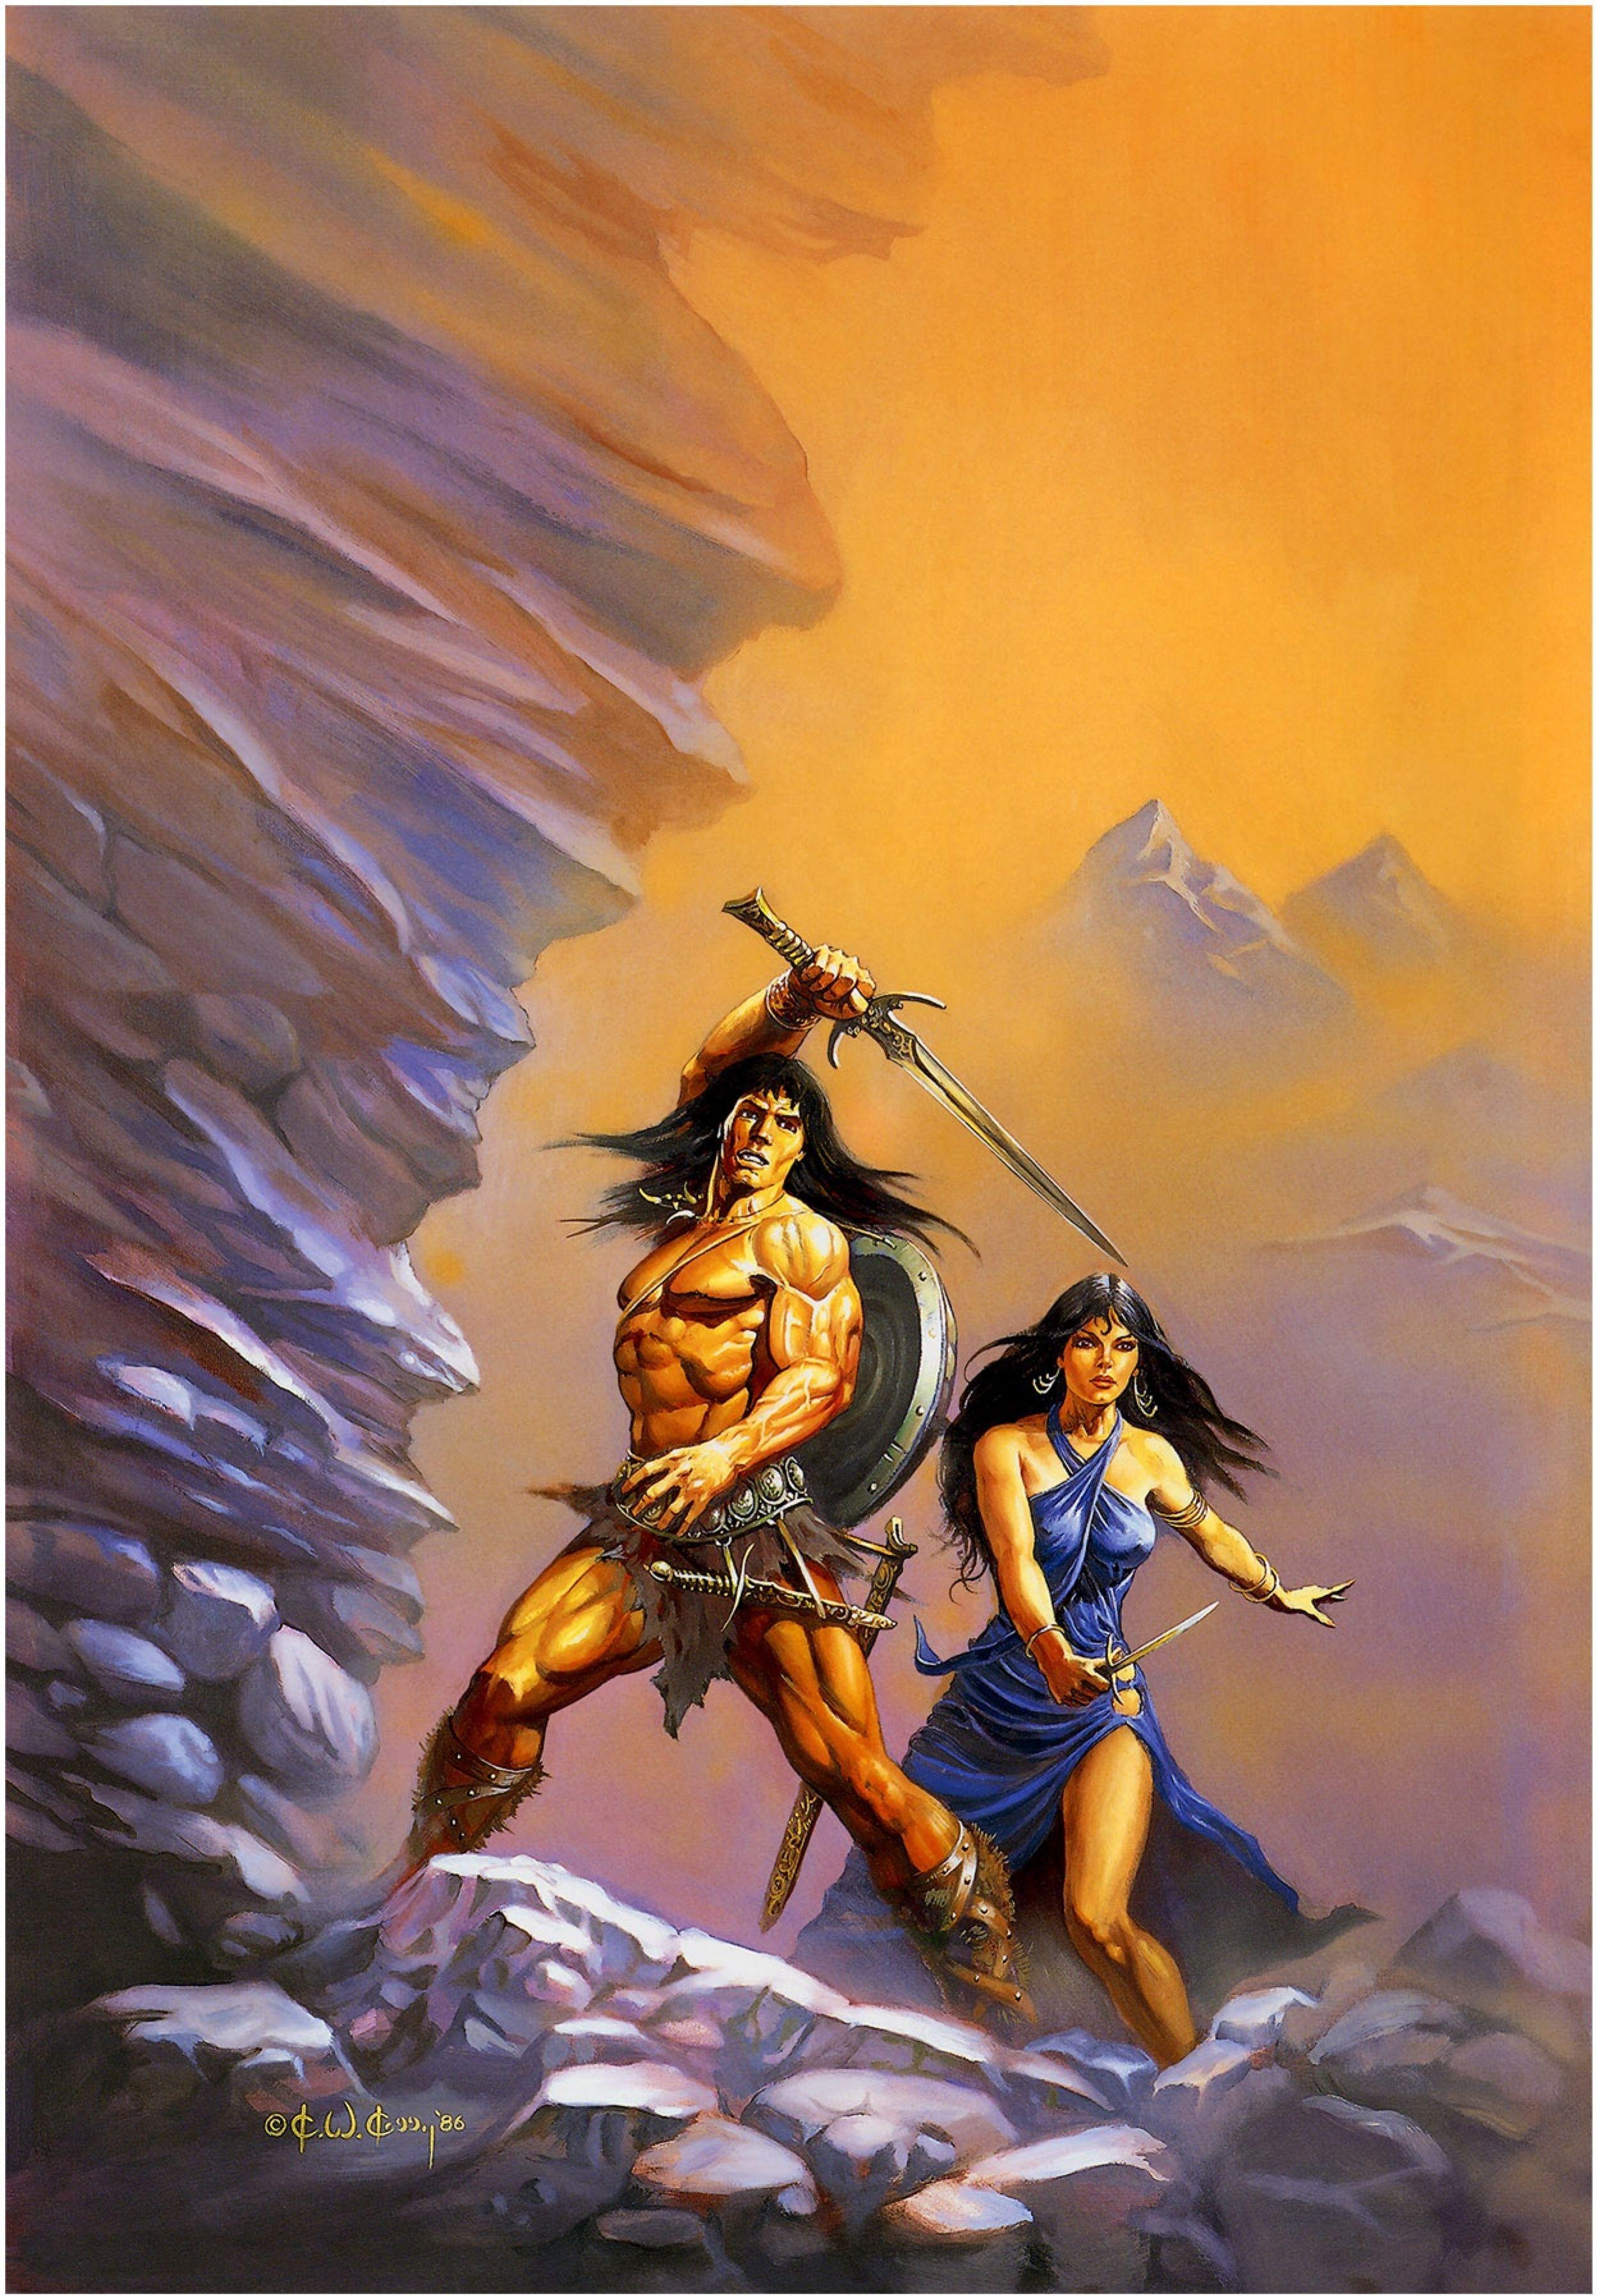 Pin by John Farnum on Conan/REH | Conan the barbarian